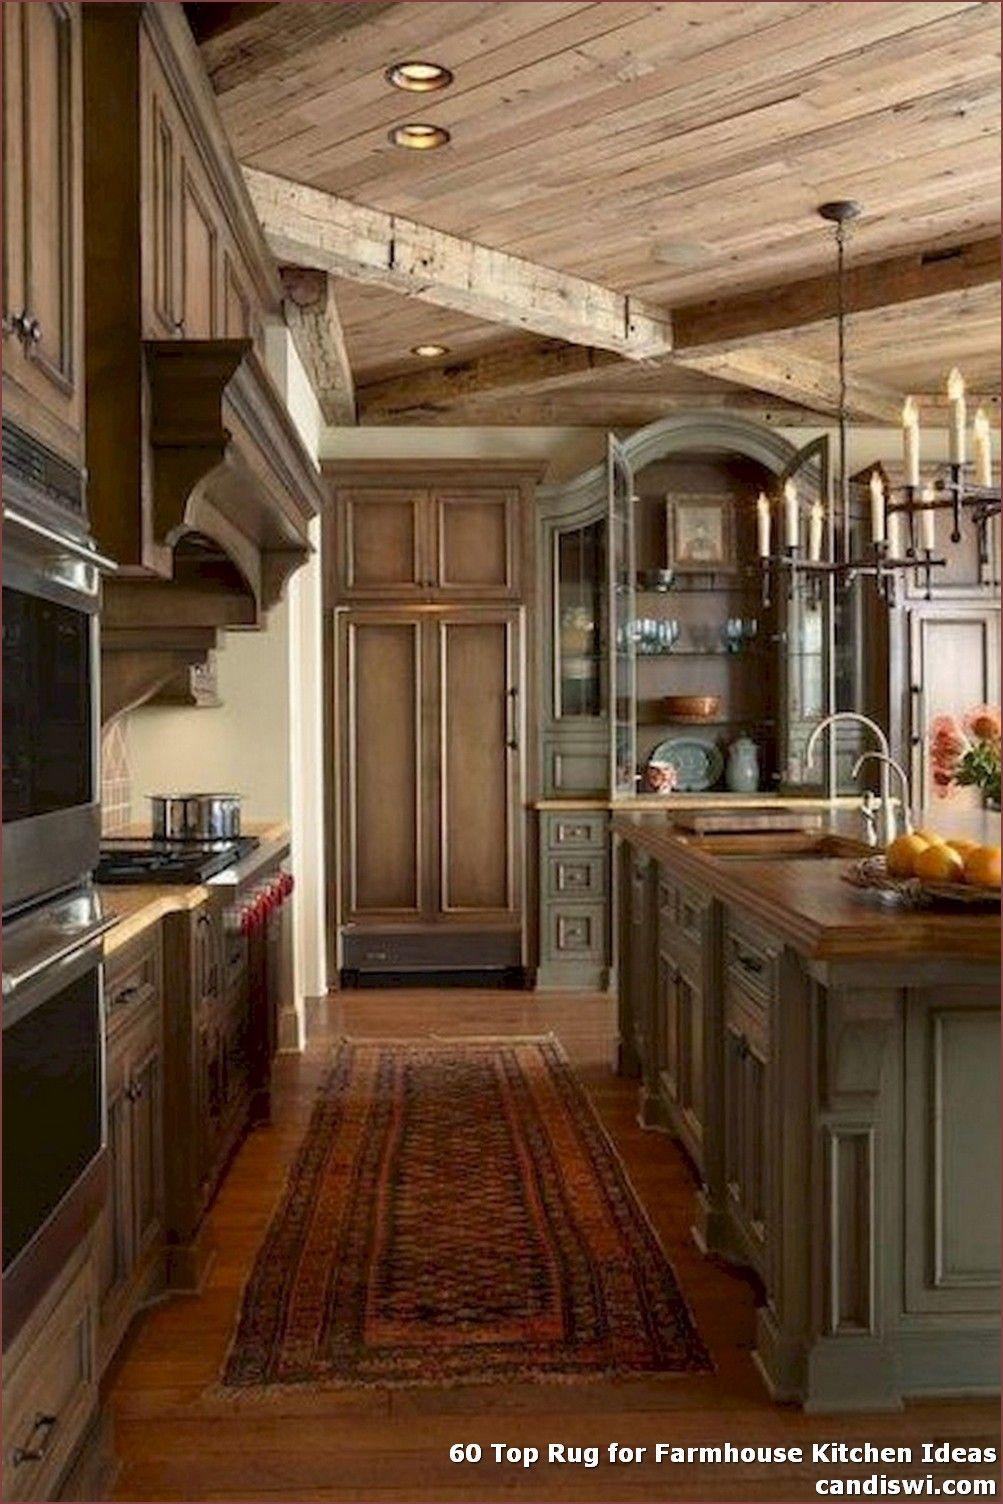 60 Top Rug For Farmhouse Kitchen Ideas Country Kitchen Designs Home Decor Kitchen Farmhouse Kitchen Decor